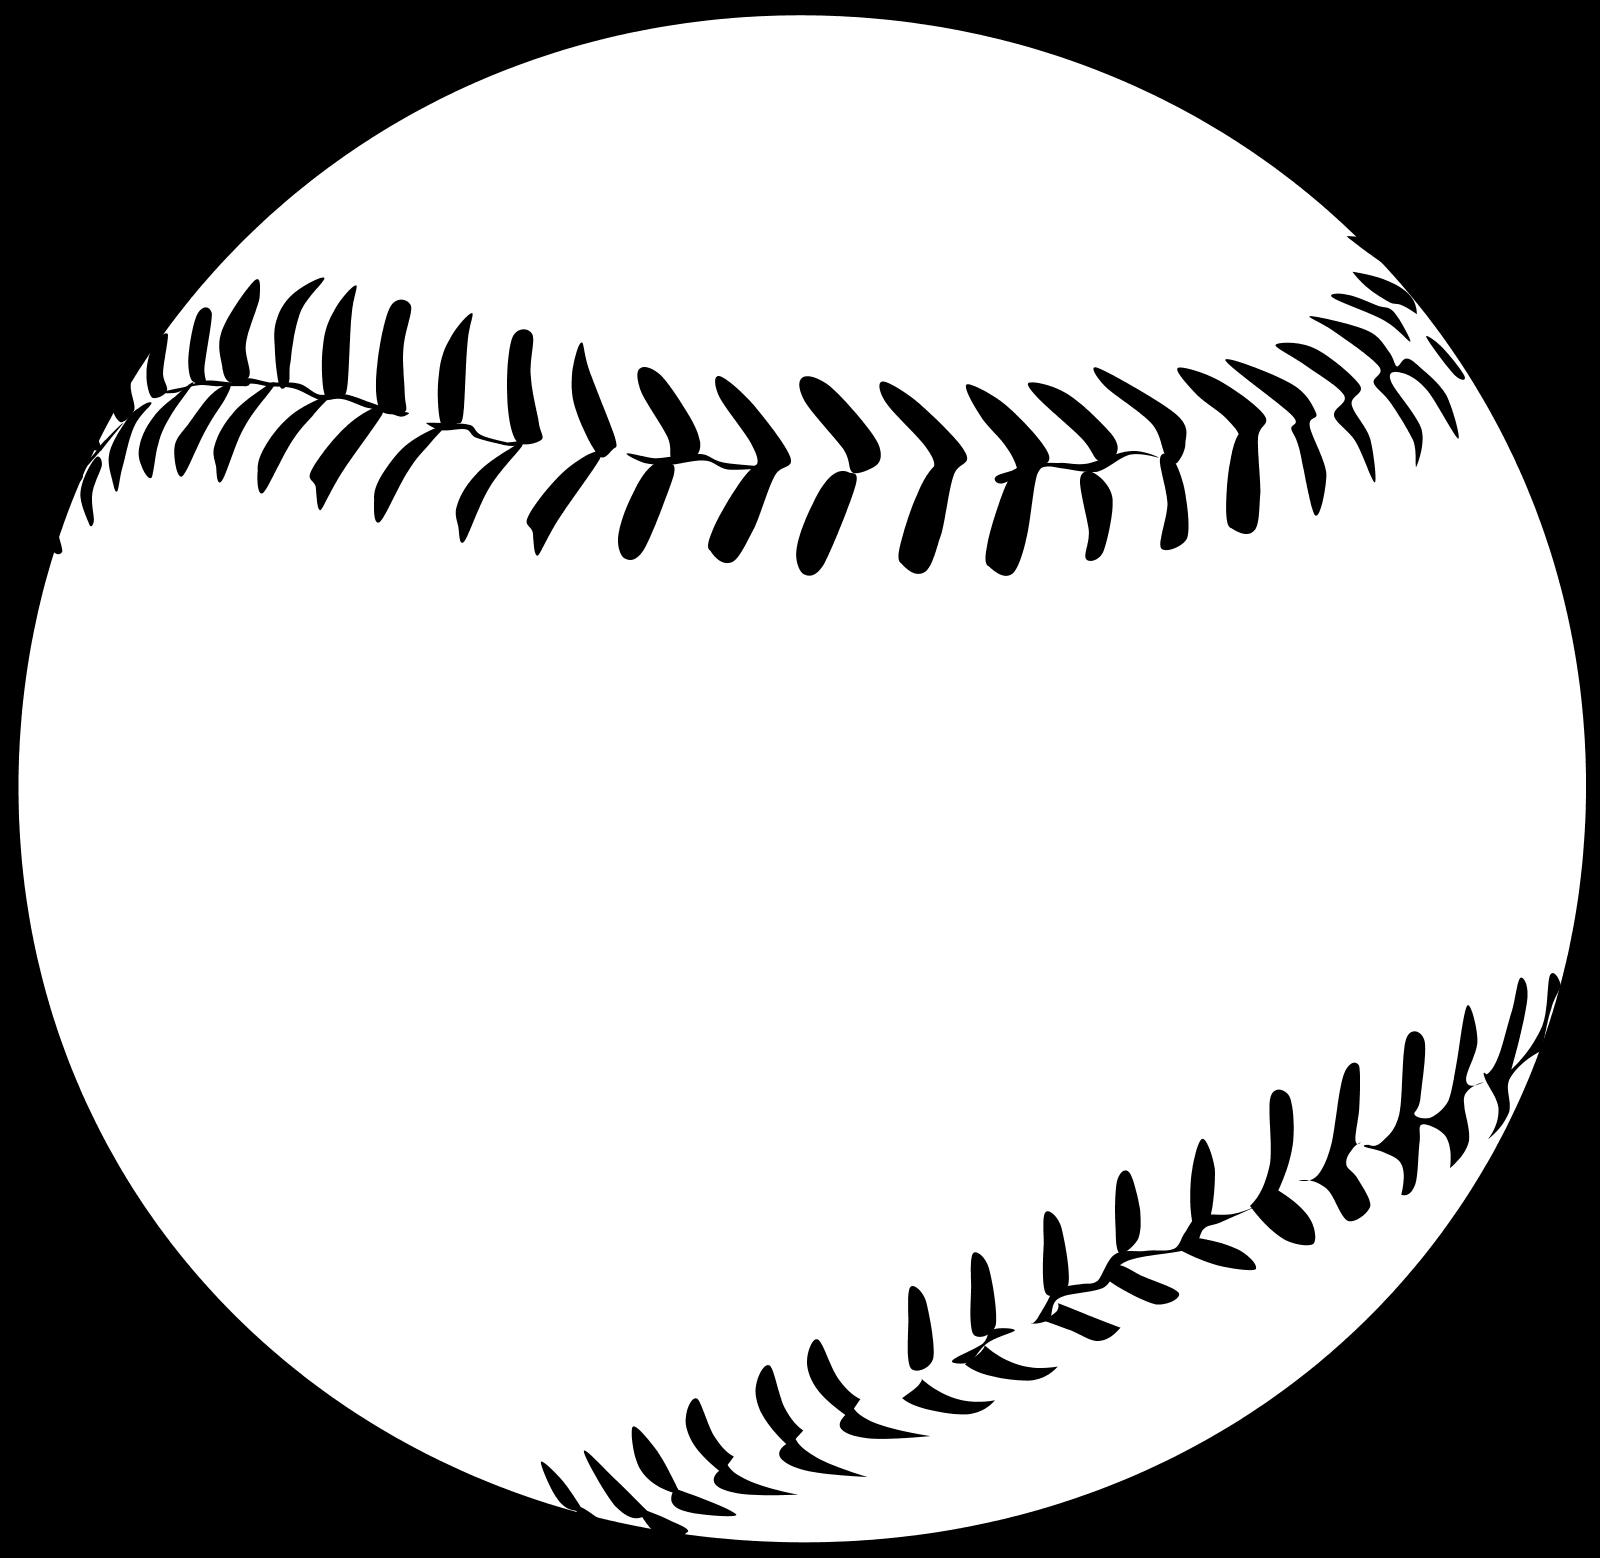 White Softball Cliparts.